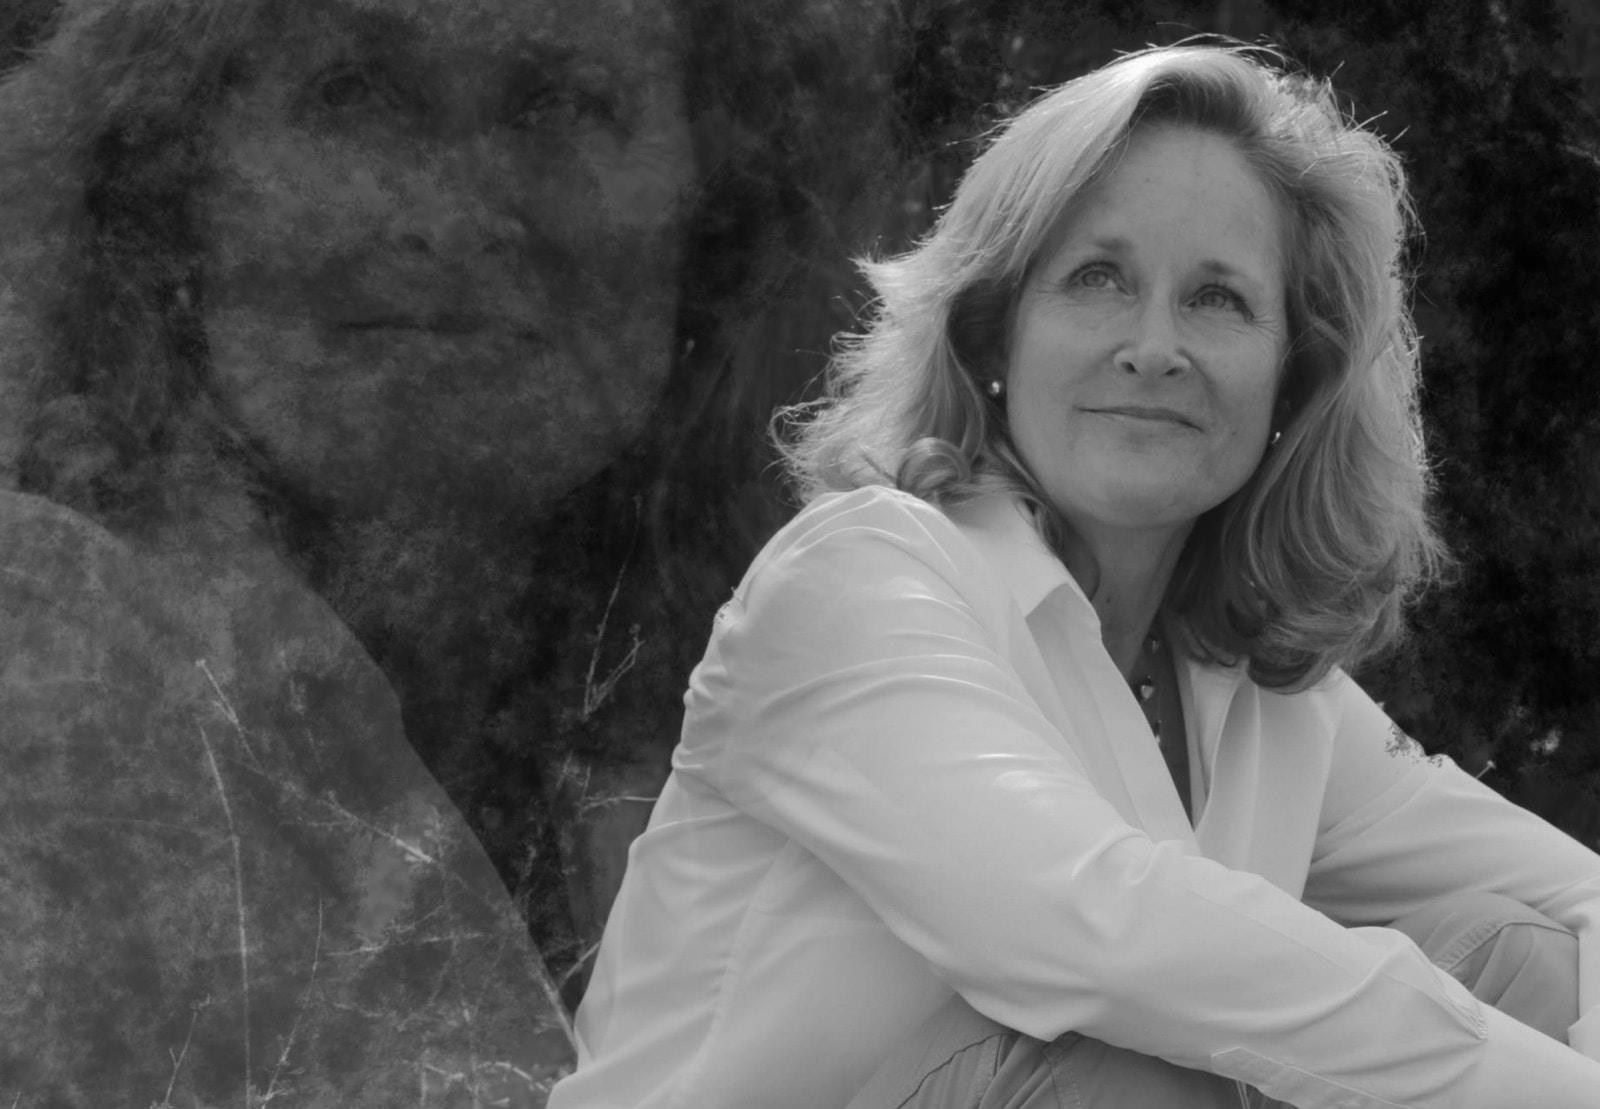 Go to Angie Corbett-Kuiper's profile